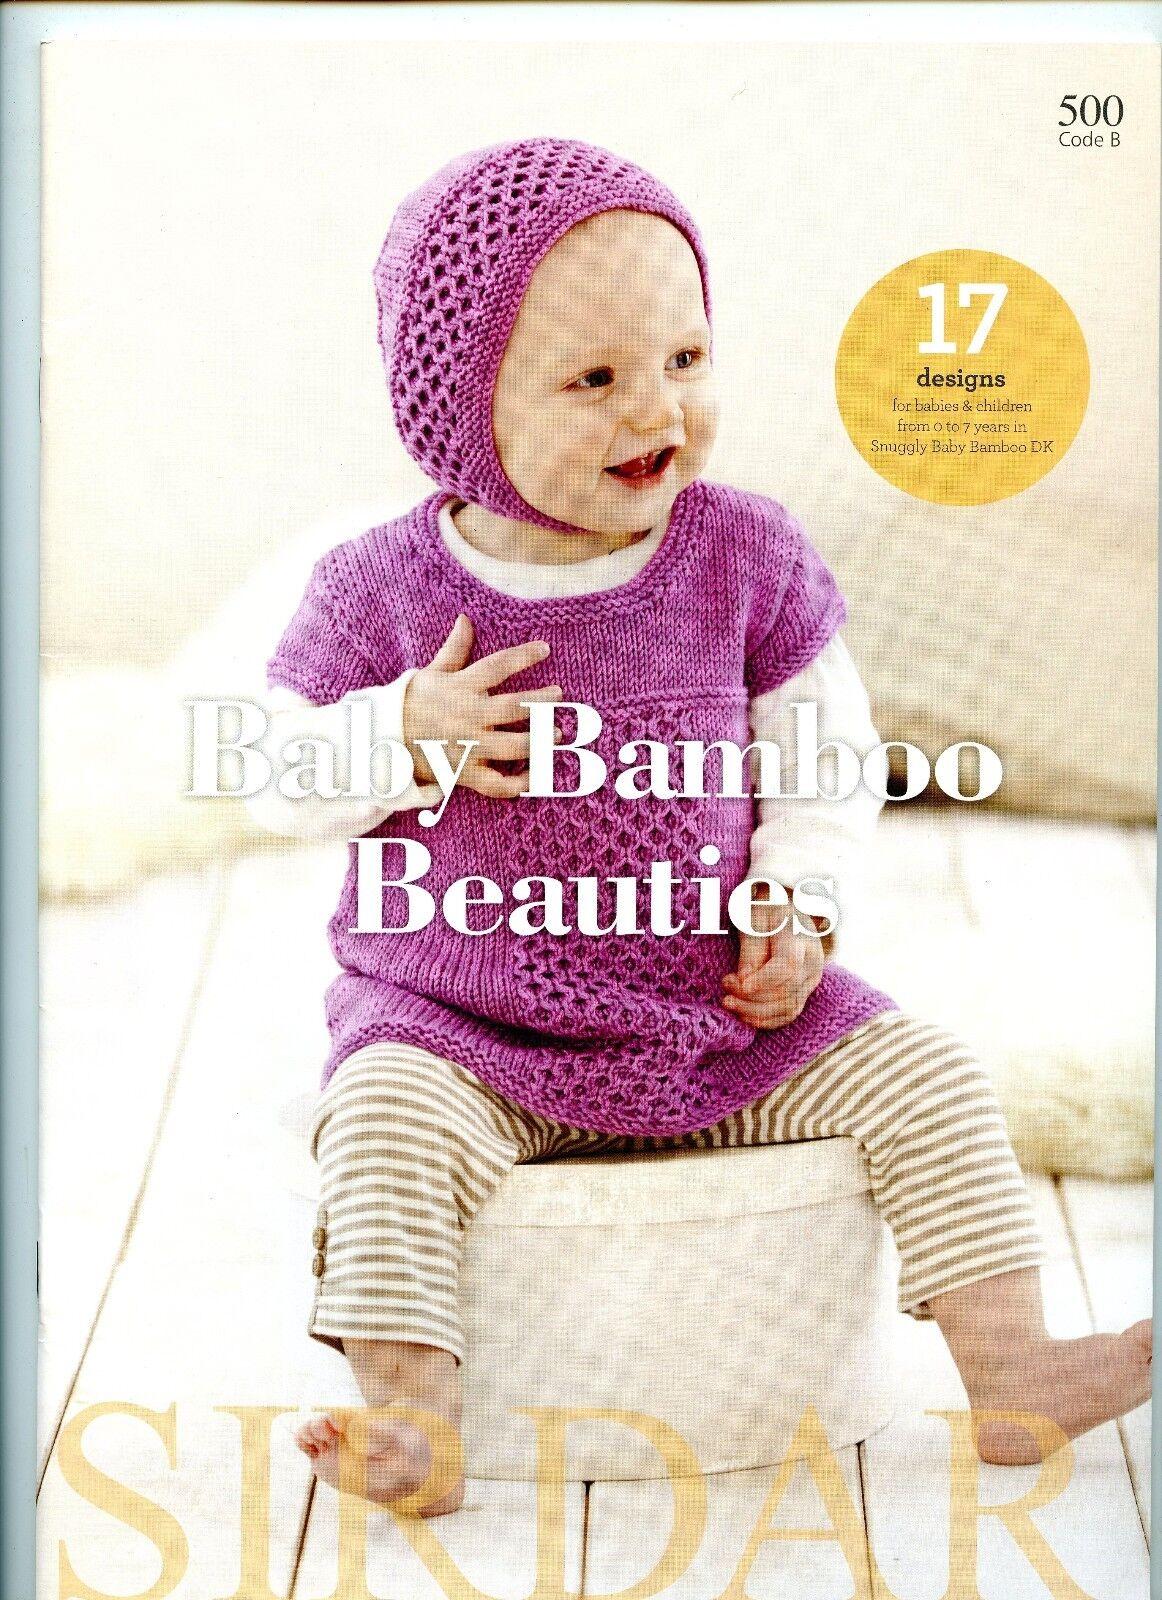 Baby Bamboo Beauties Sirdar Knitting Pattern Book 500 - 17 Designs ...